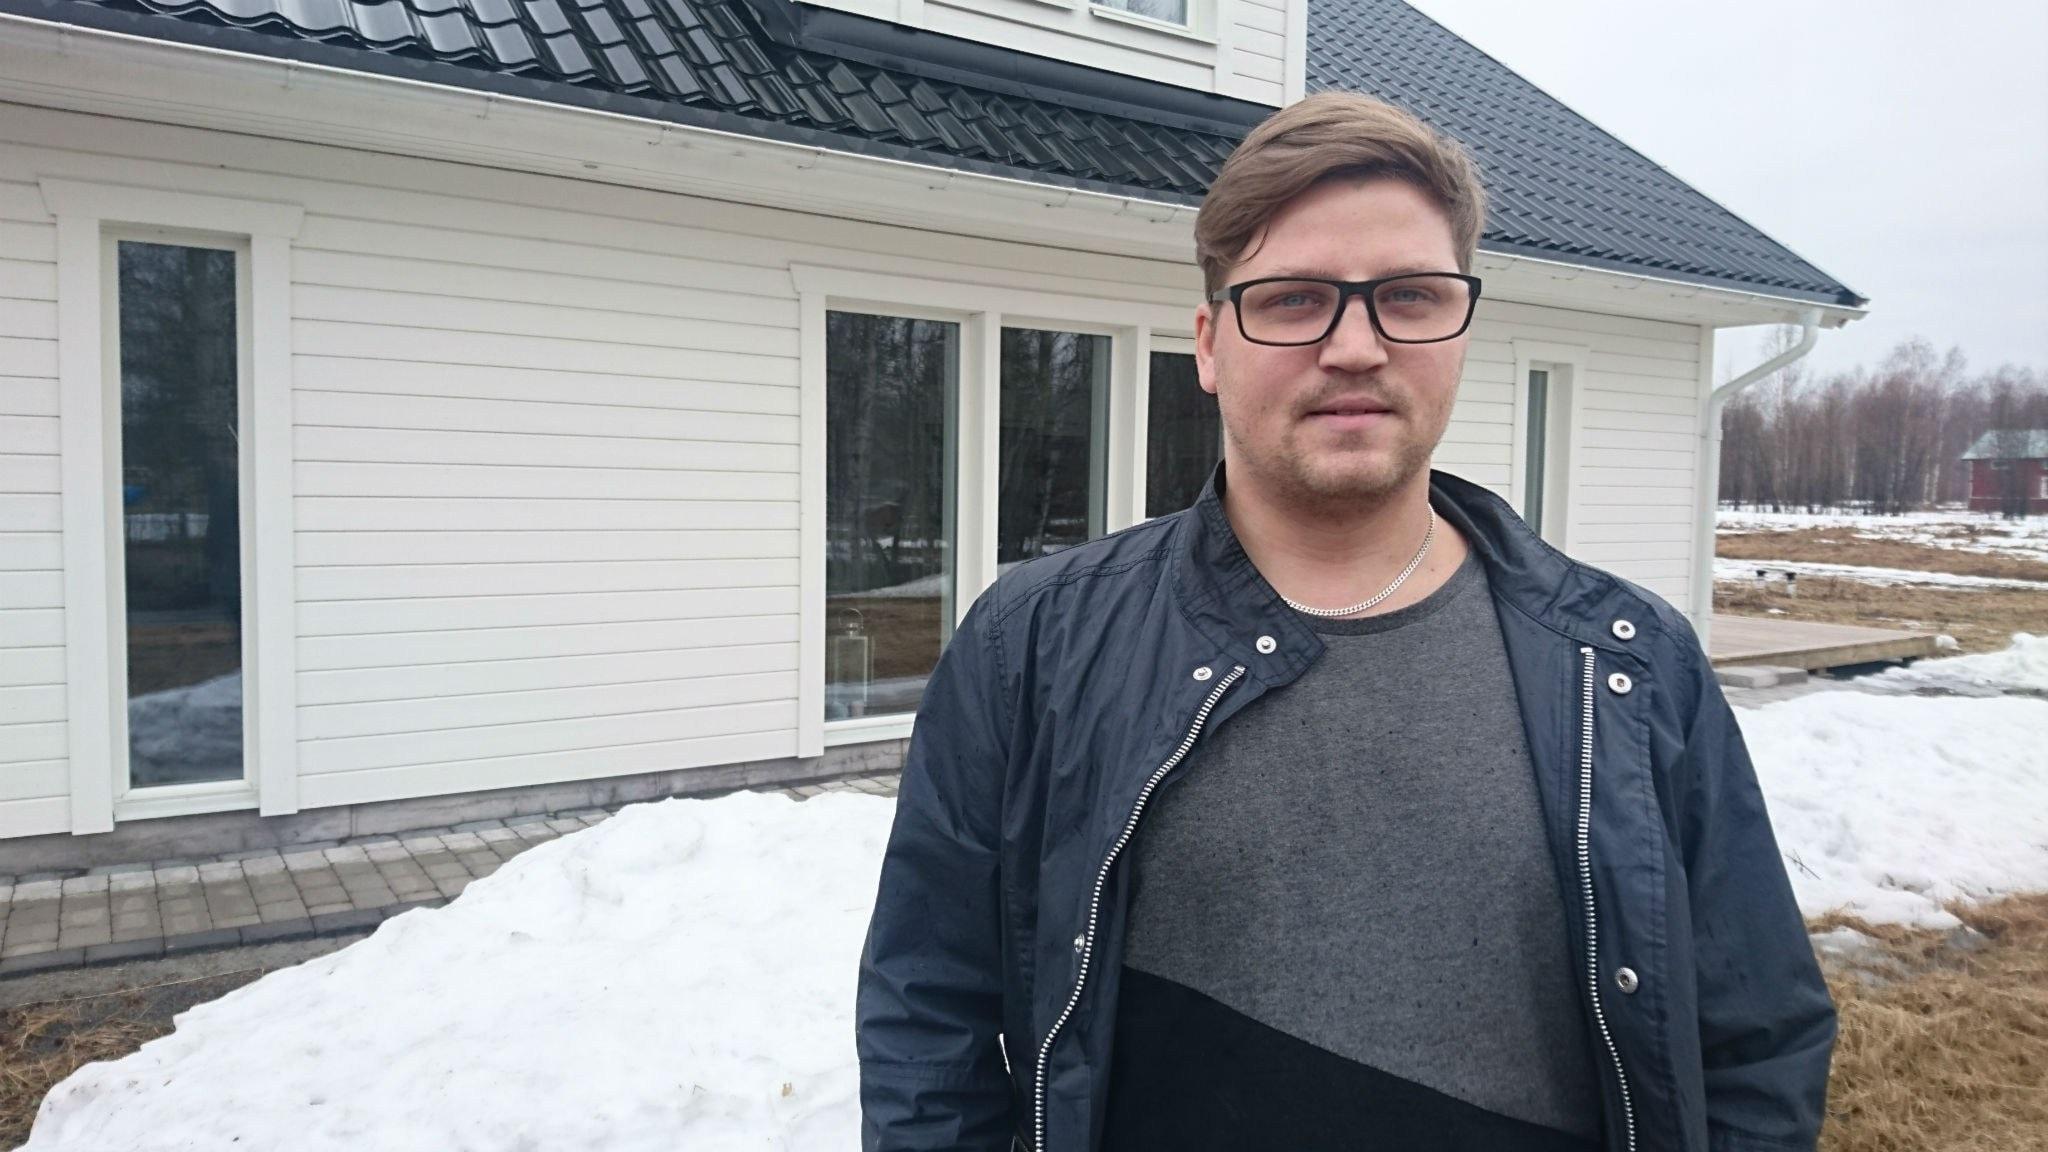 Brnnberg 48 Norrbottens Ln, Boden - patient-survey.net